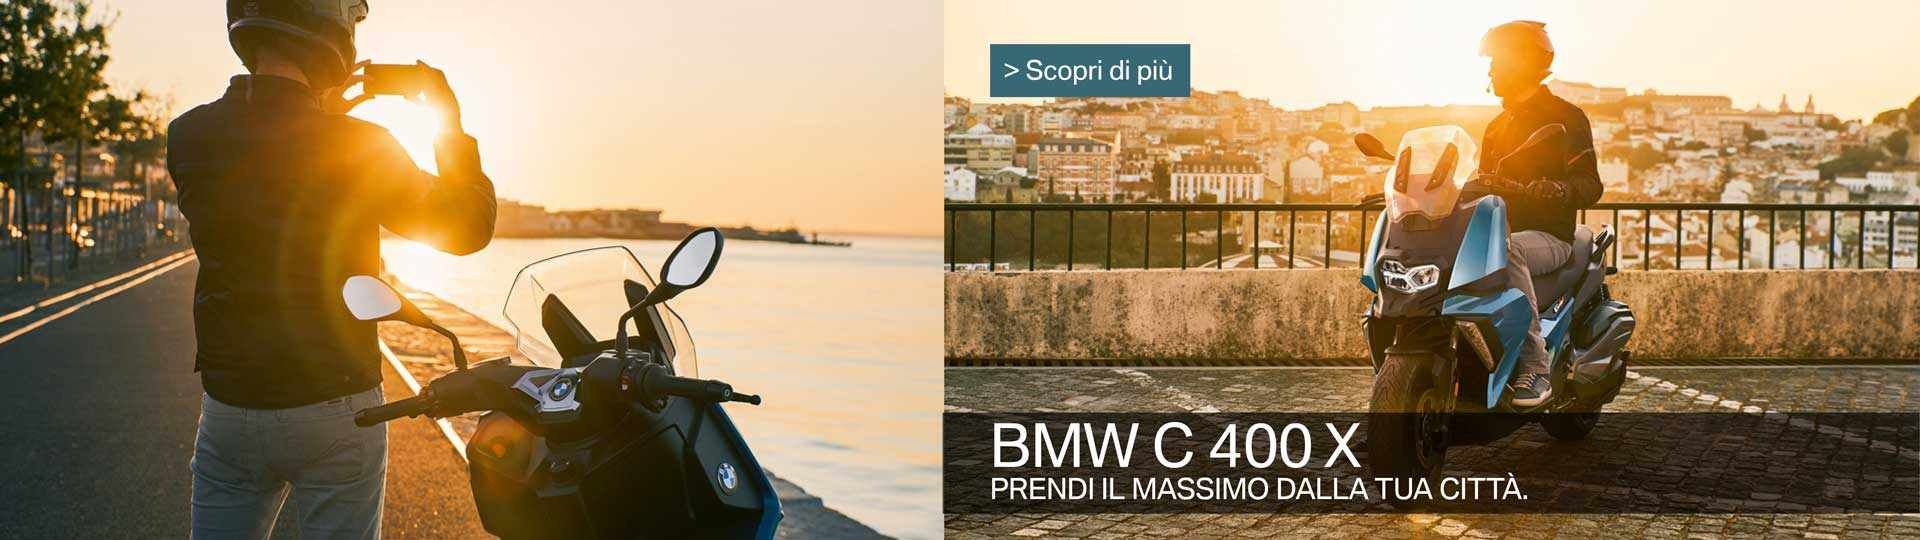 BMW-C-400-X-min.jpg